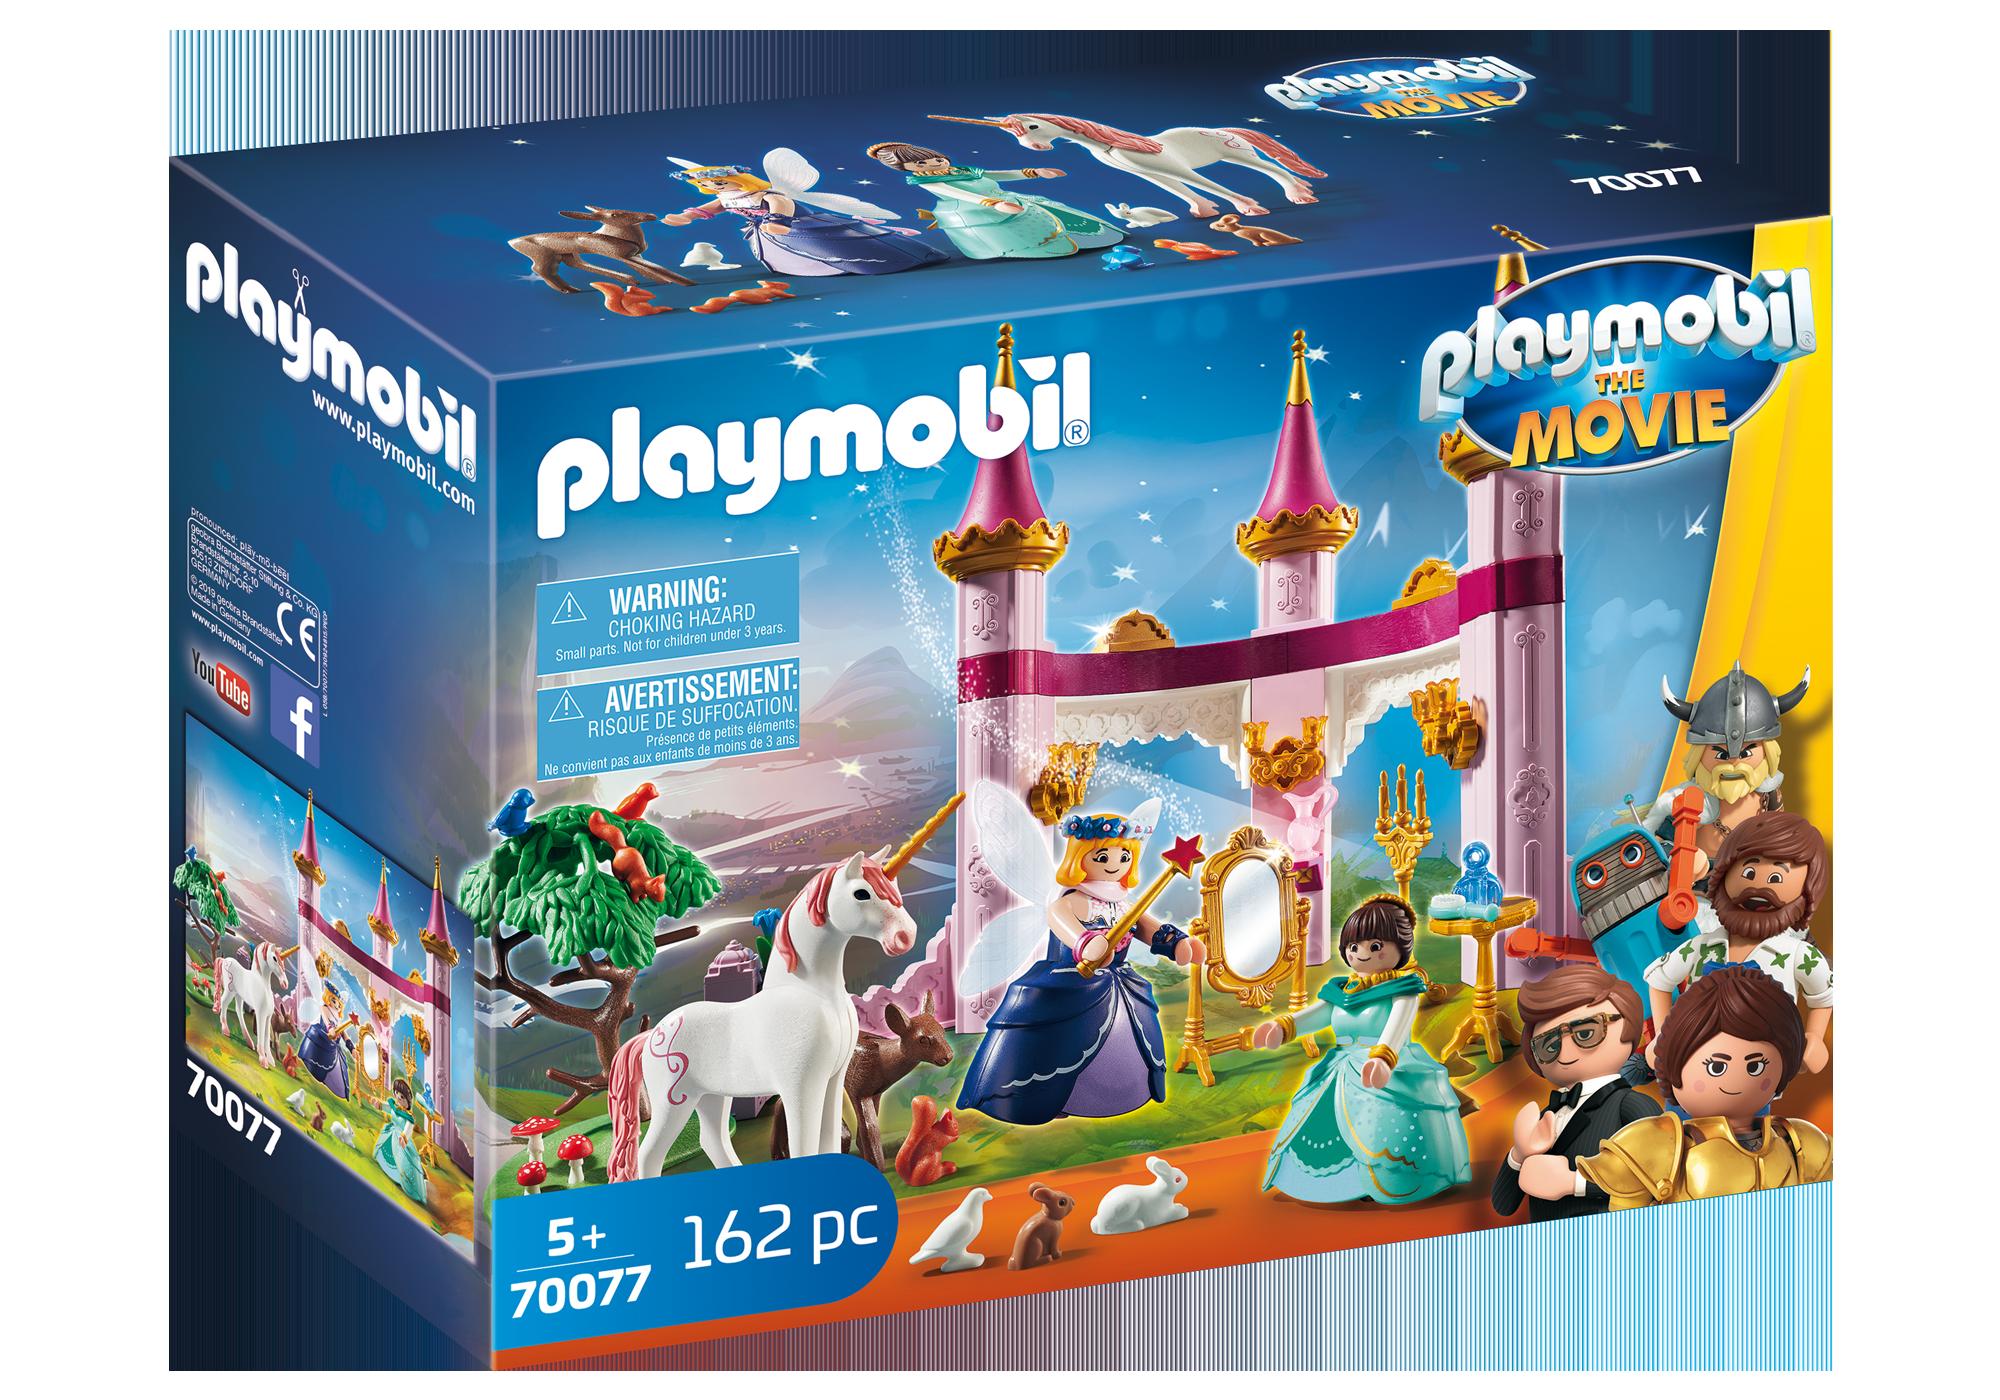 http://media.playmobil.com/i/playmobil/70077_product_box_front/PLAYMOBIL:THE MOVIE Marla im Märchenschloss